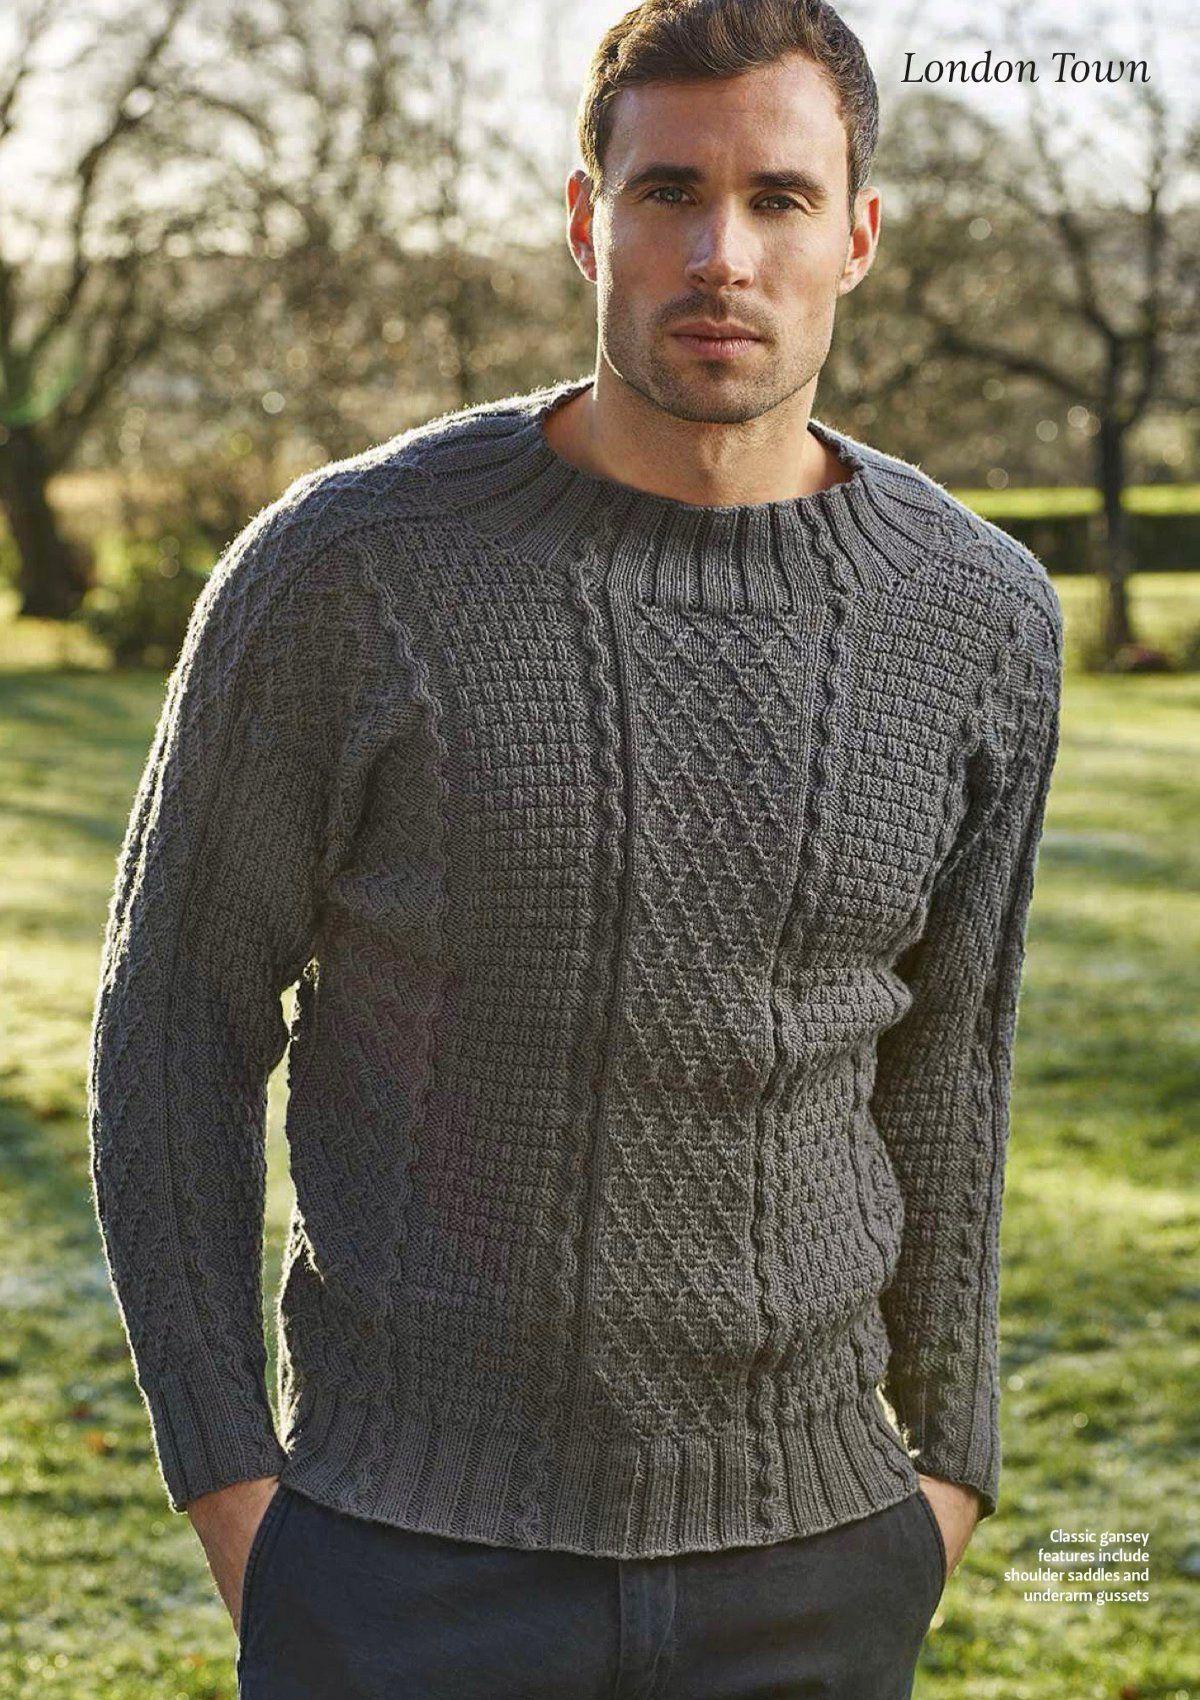 de82cf7c2a617 Пуловер мужской London Town вязаный спицами вкруговую из журнала The  Knitter 82. Мужской Свитер